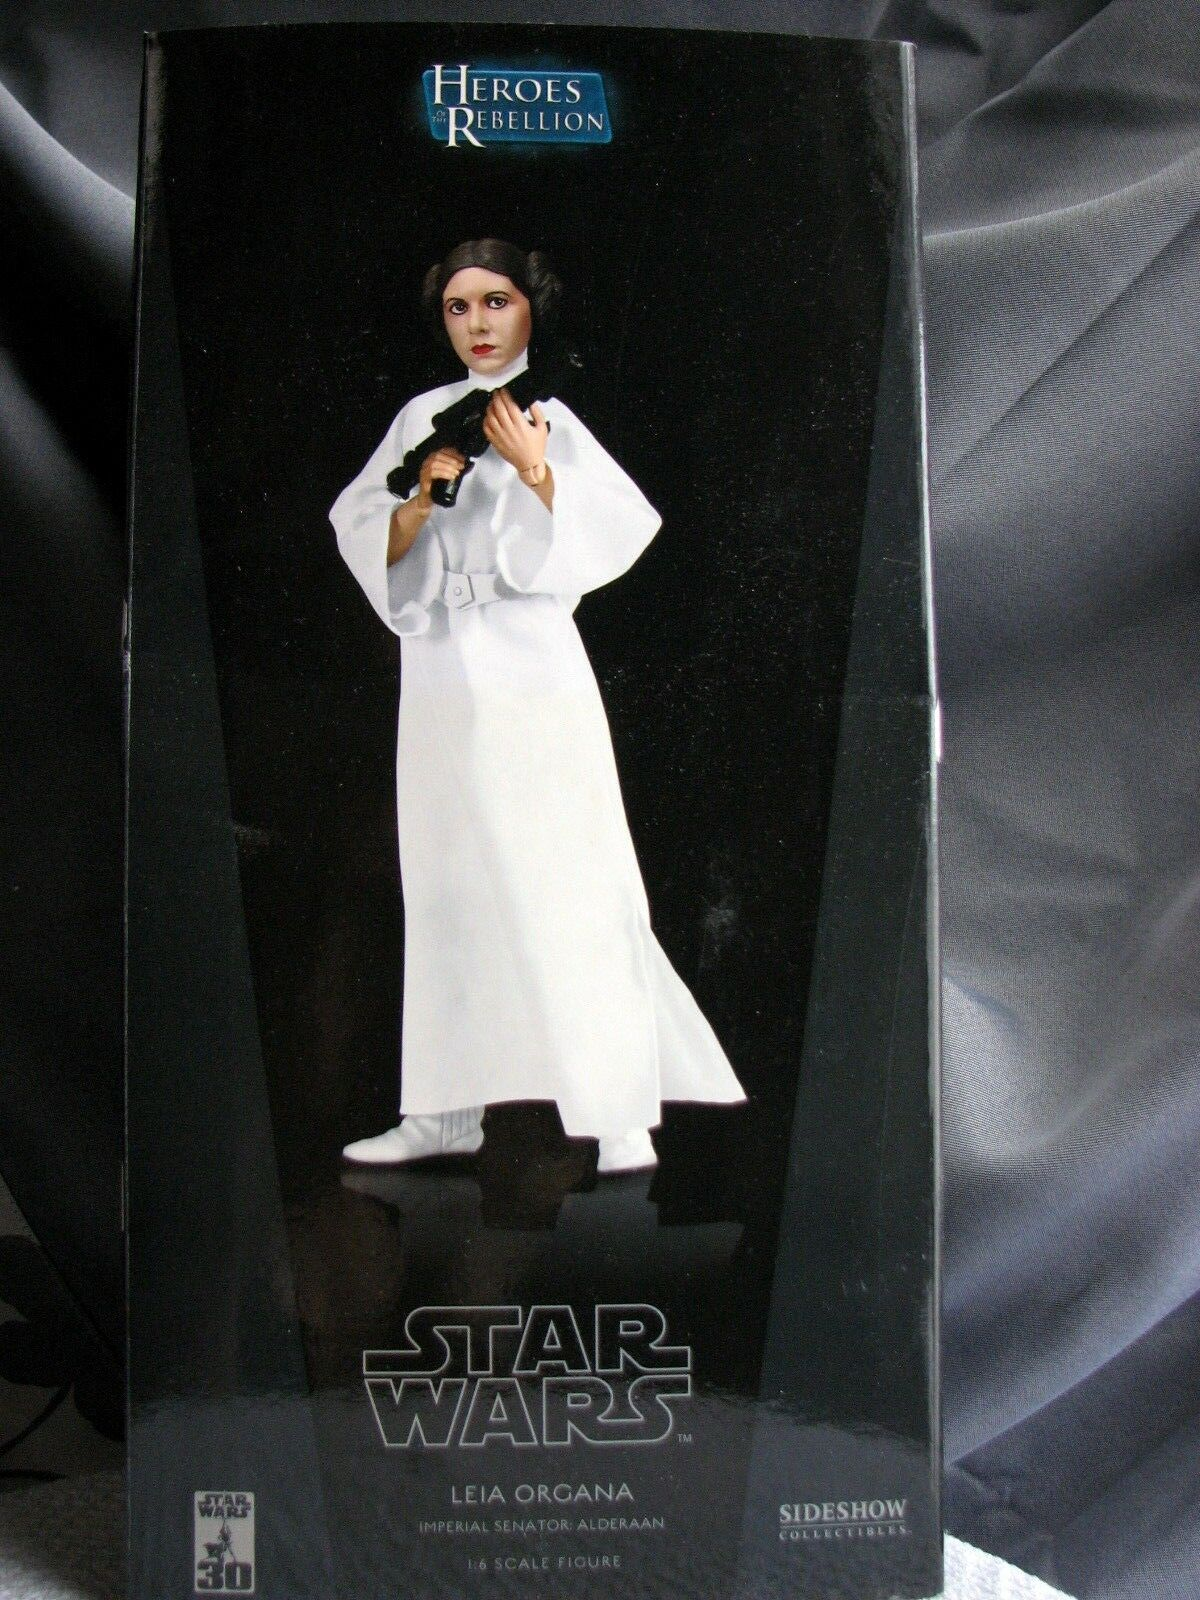 Sideshow Star Wars Leia Organa Imperial Senator  Alderaan 1 6 Scale 12  figure